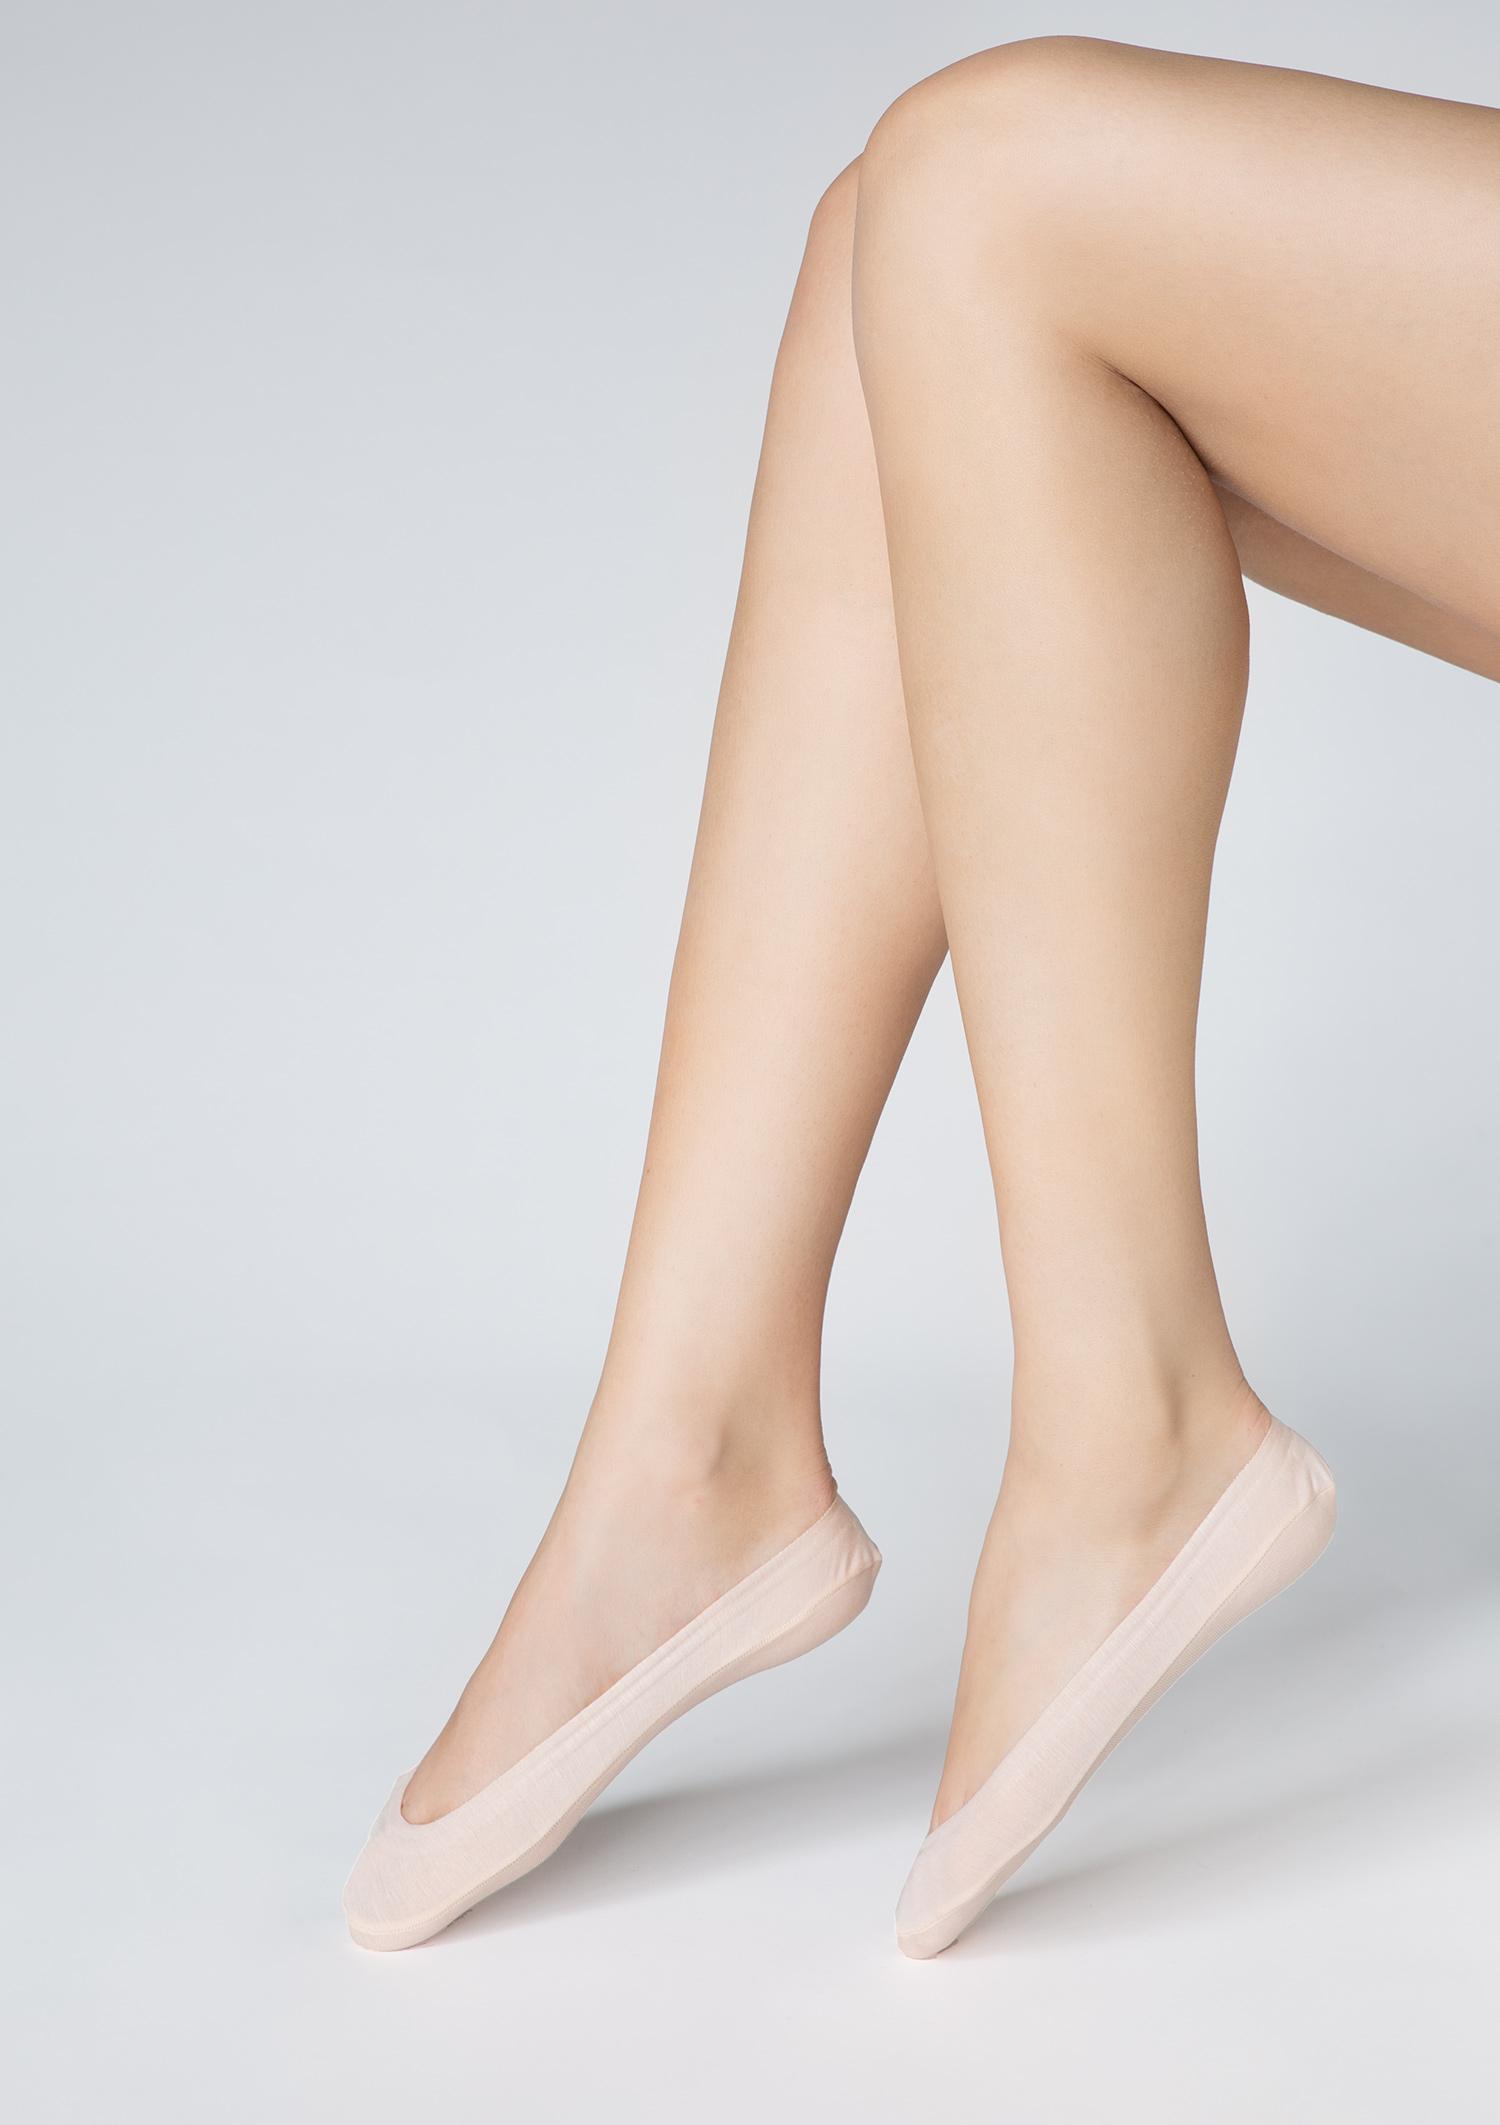 https://golden-legs.com.ua/images/stories/virtuemart/product/B66.jpg